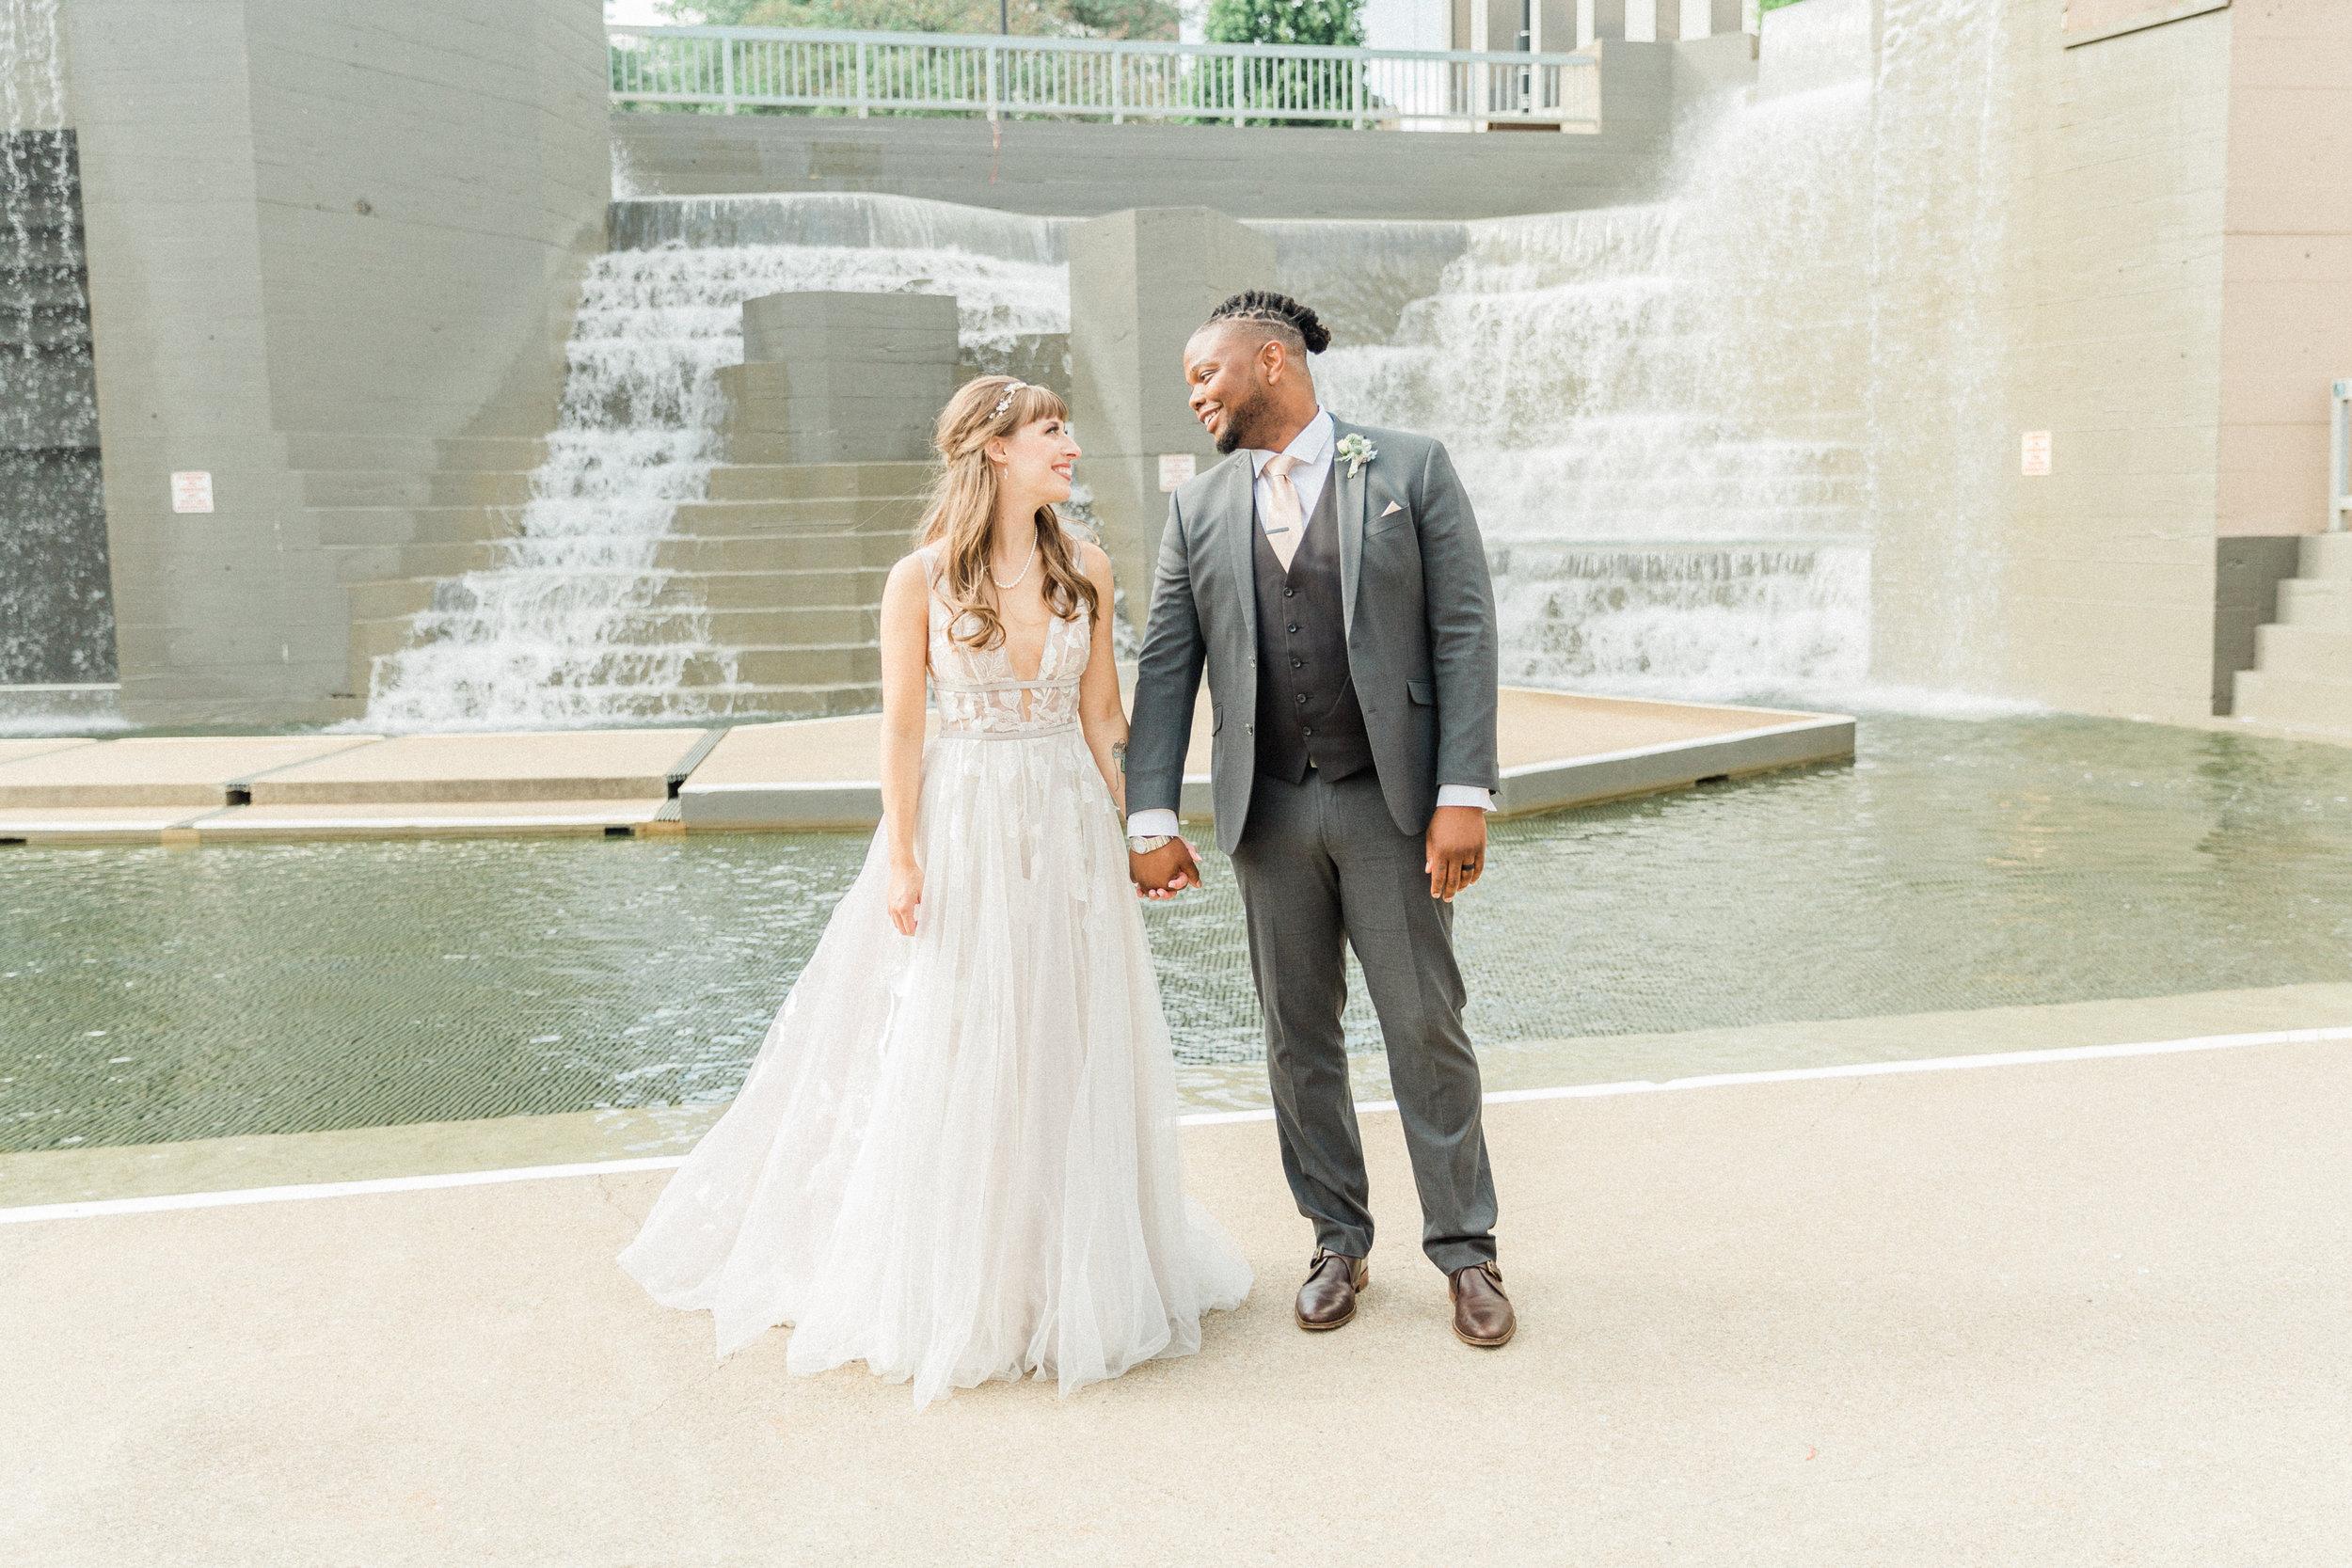 Mallory and Aaron - Married - Sneaks - Lauren Alisse Photography-58.jpg